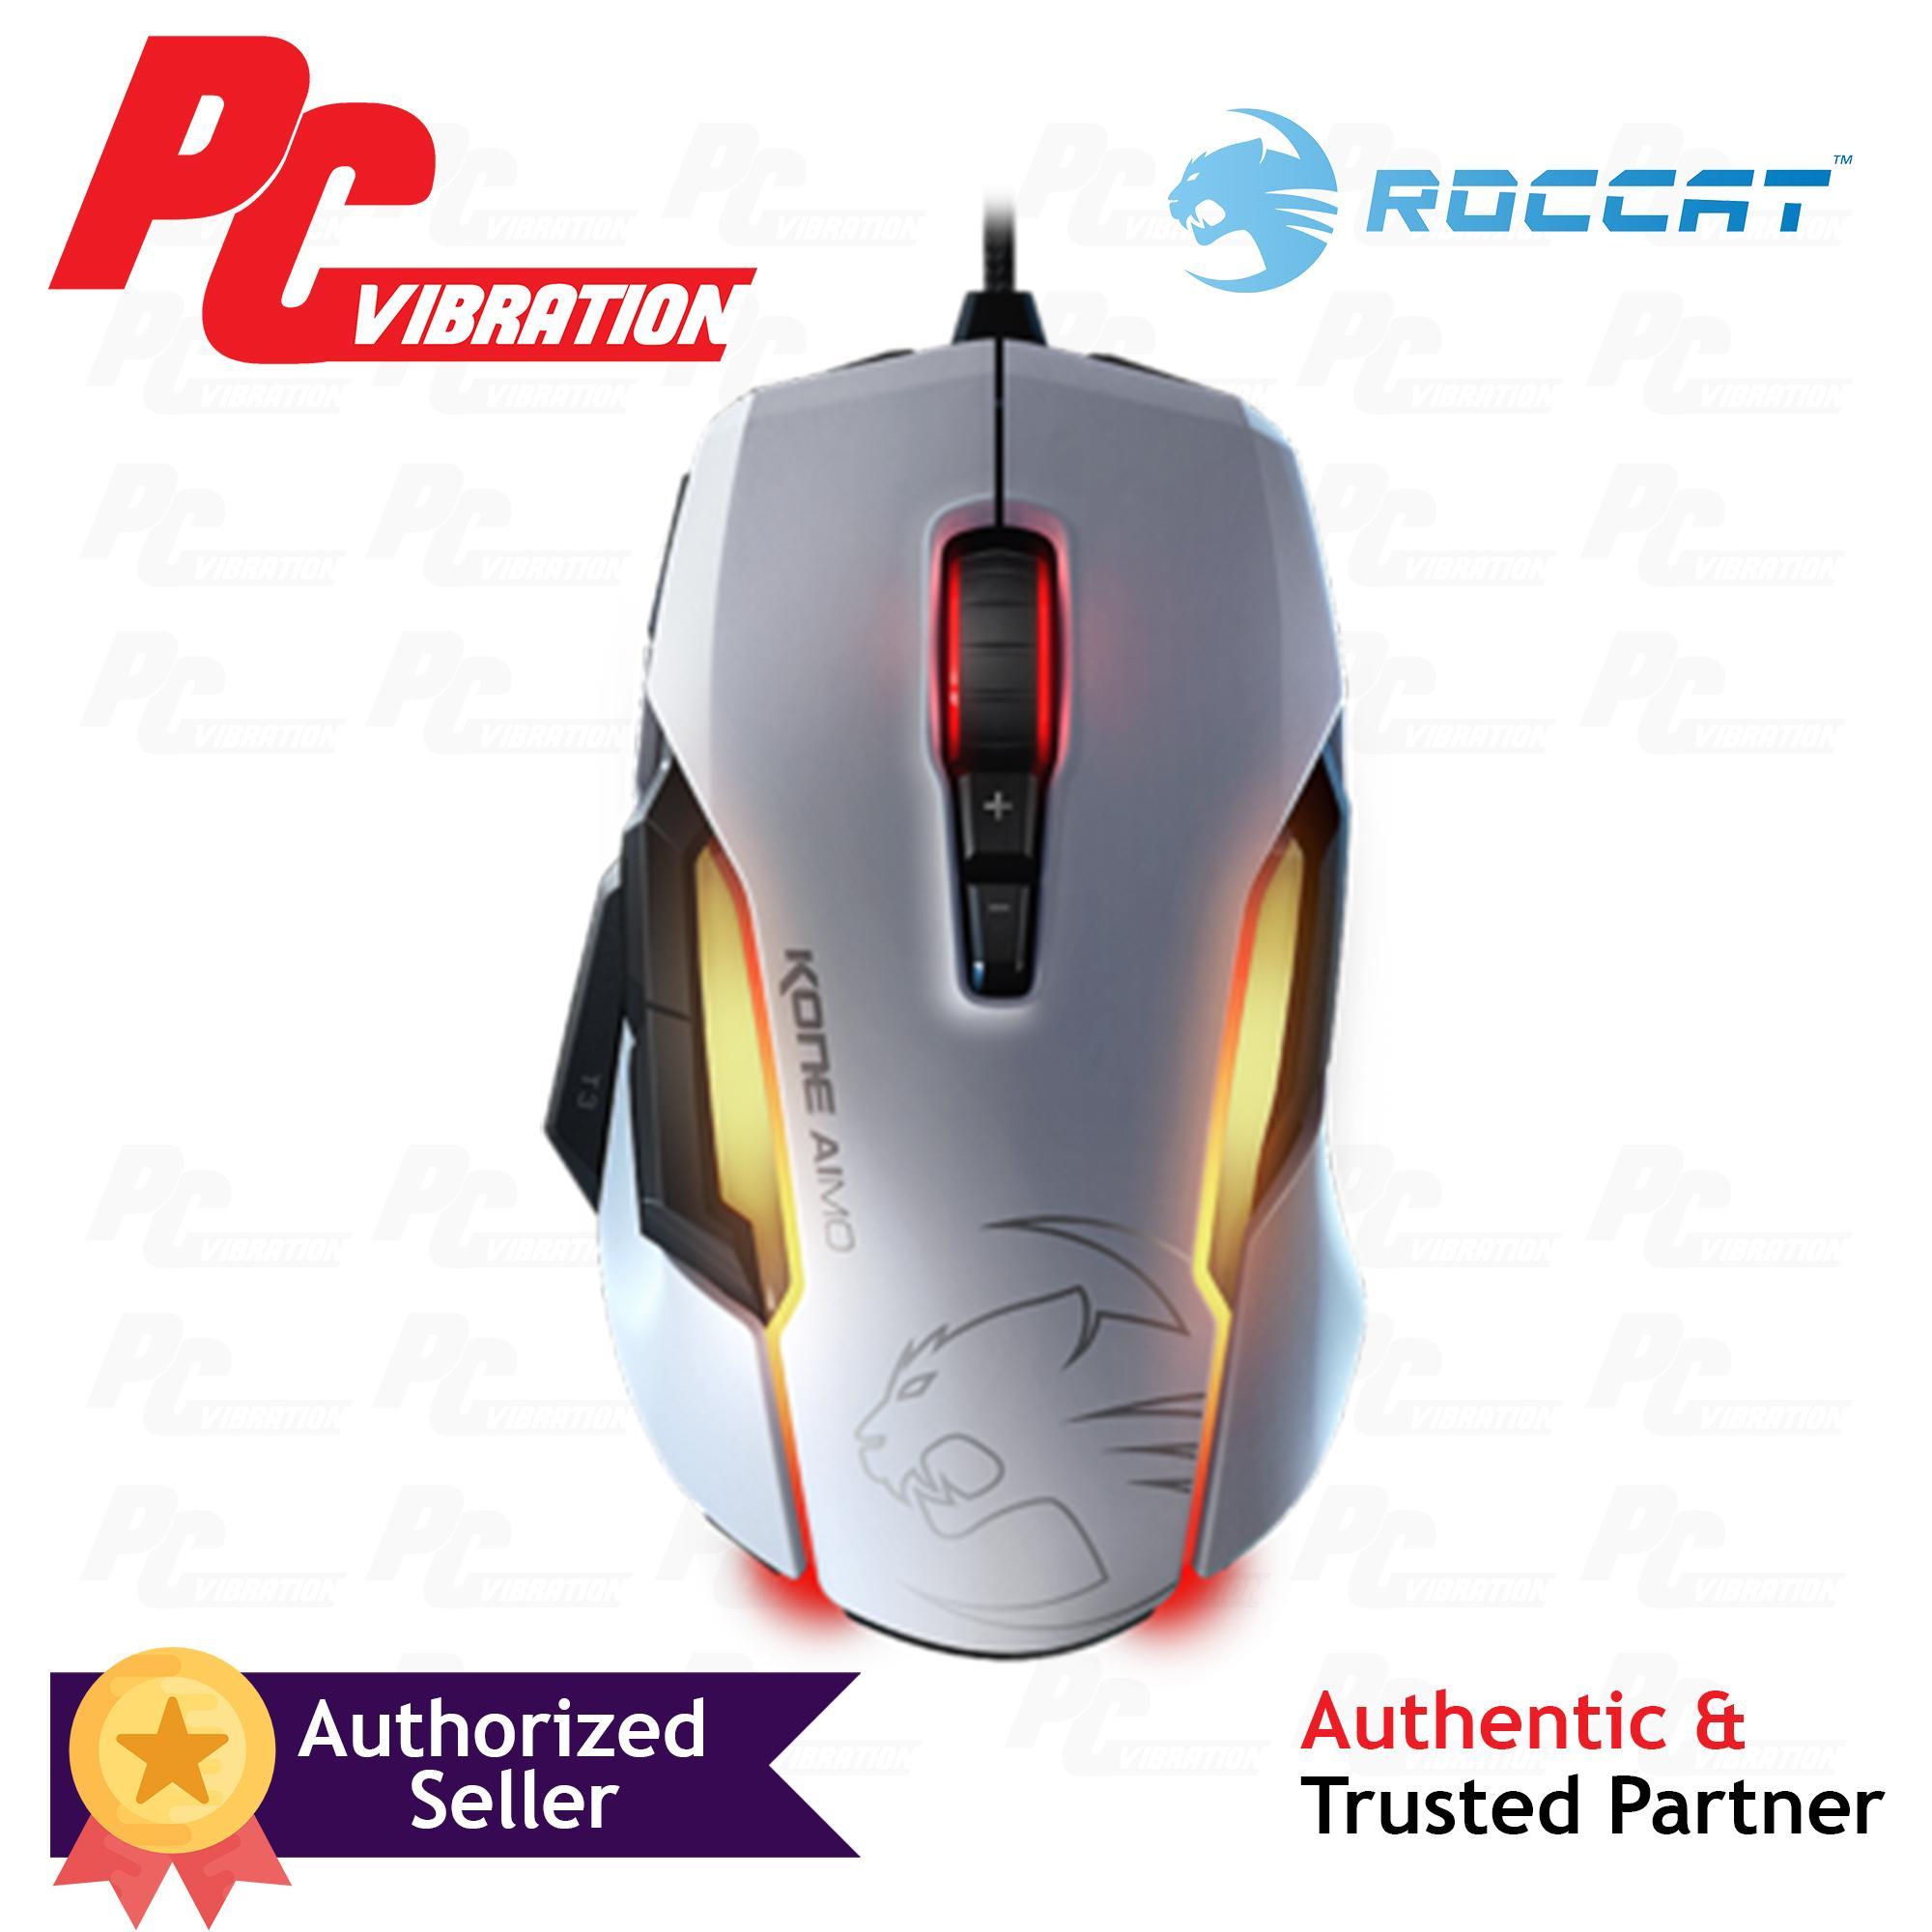 ddfa0388ca5 Roccat Philippines: Roccat price list - PC Gaming, Gaming Mice ...